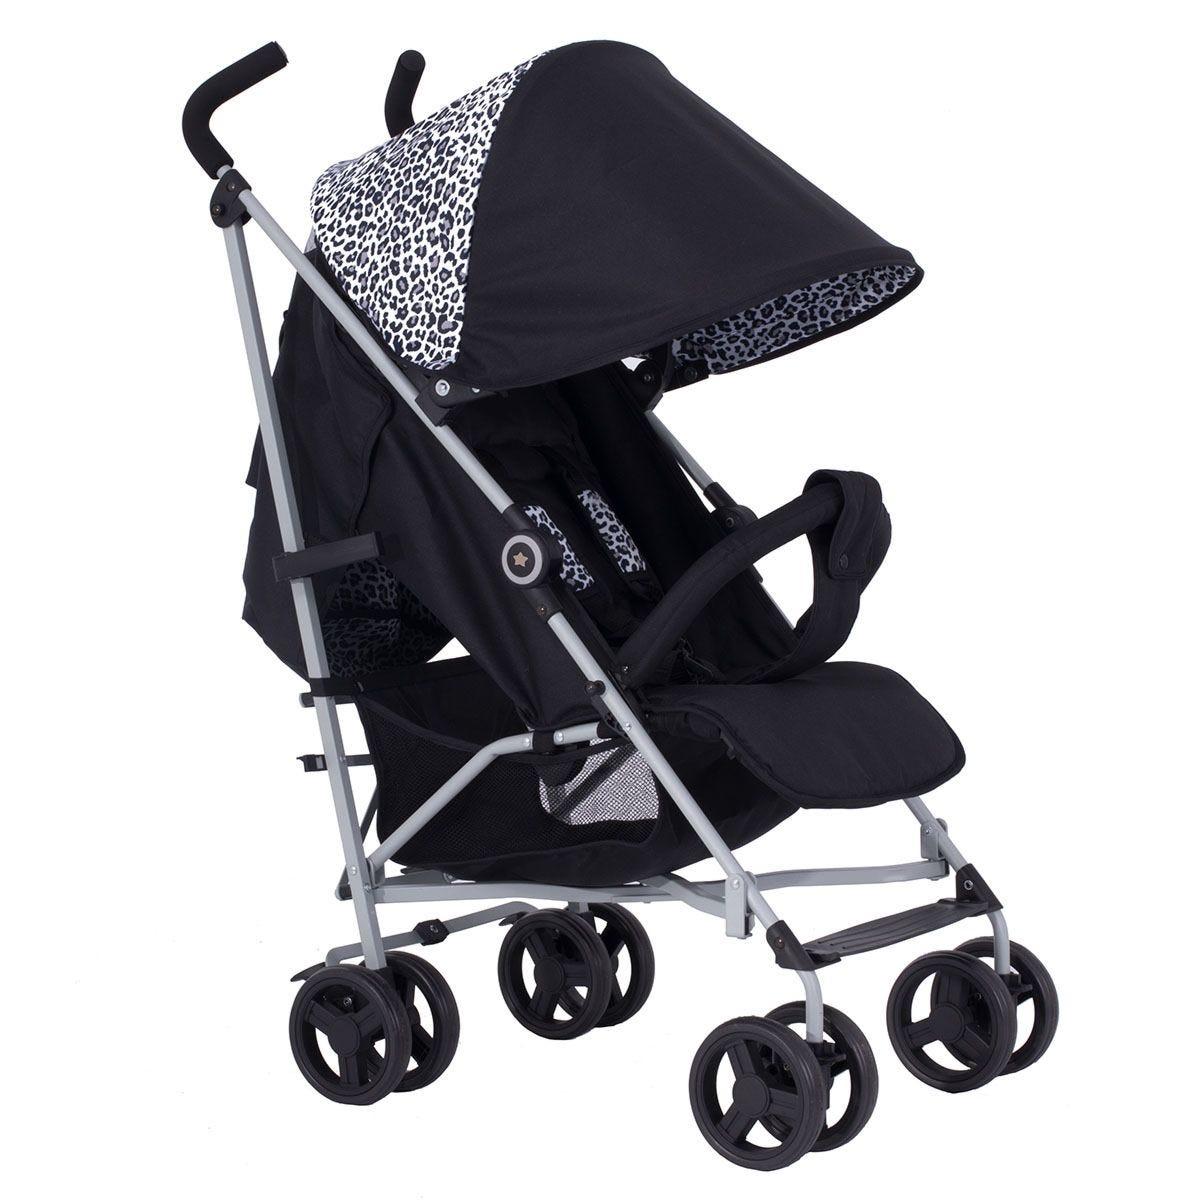 My Babiie Dreamiie MB02 Stroller - Black Leopard